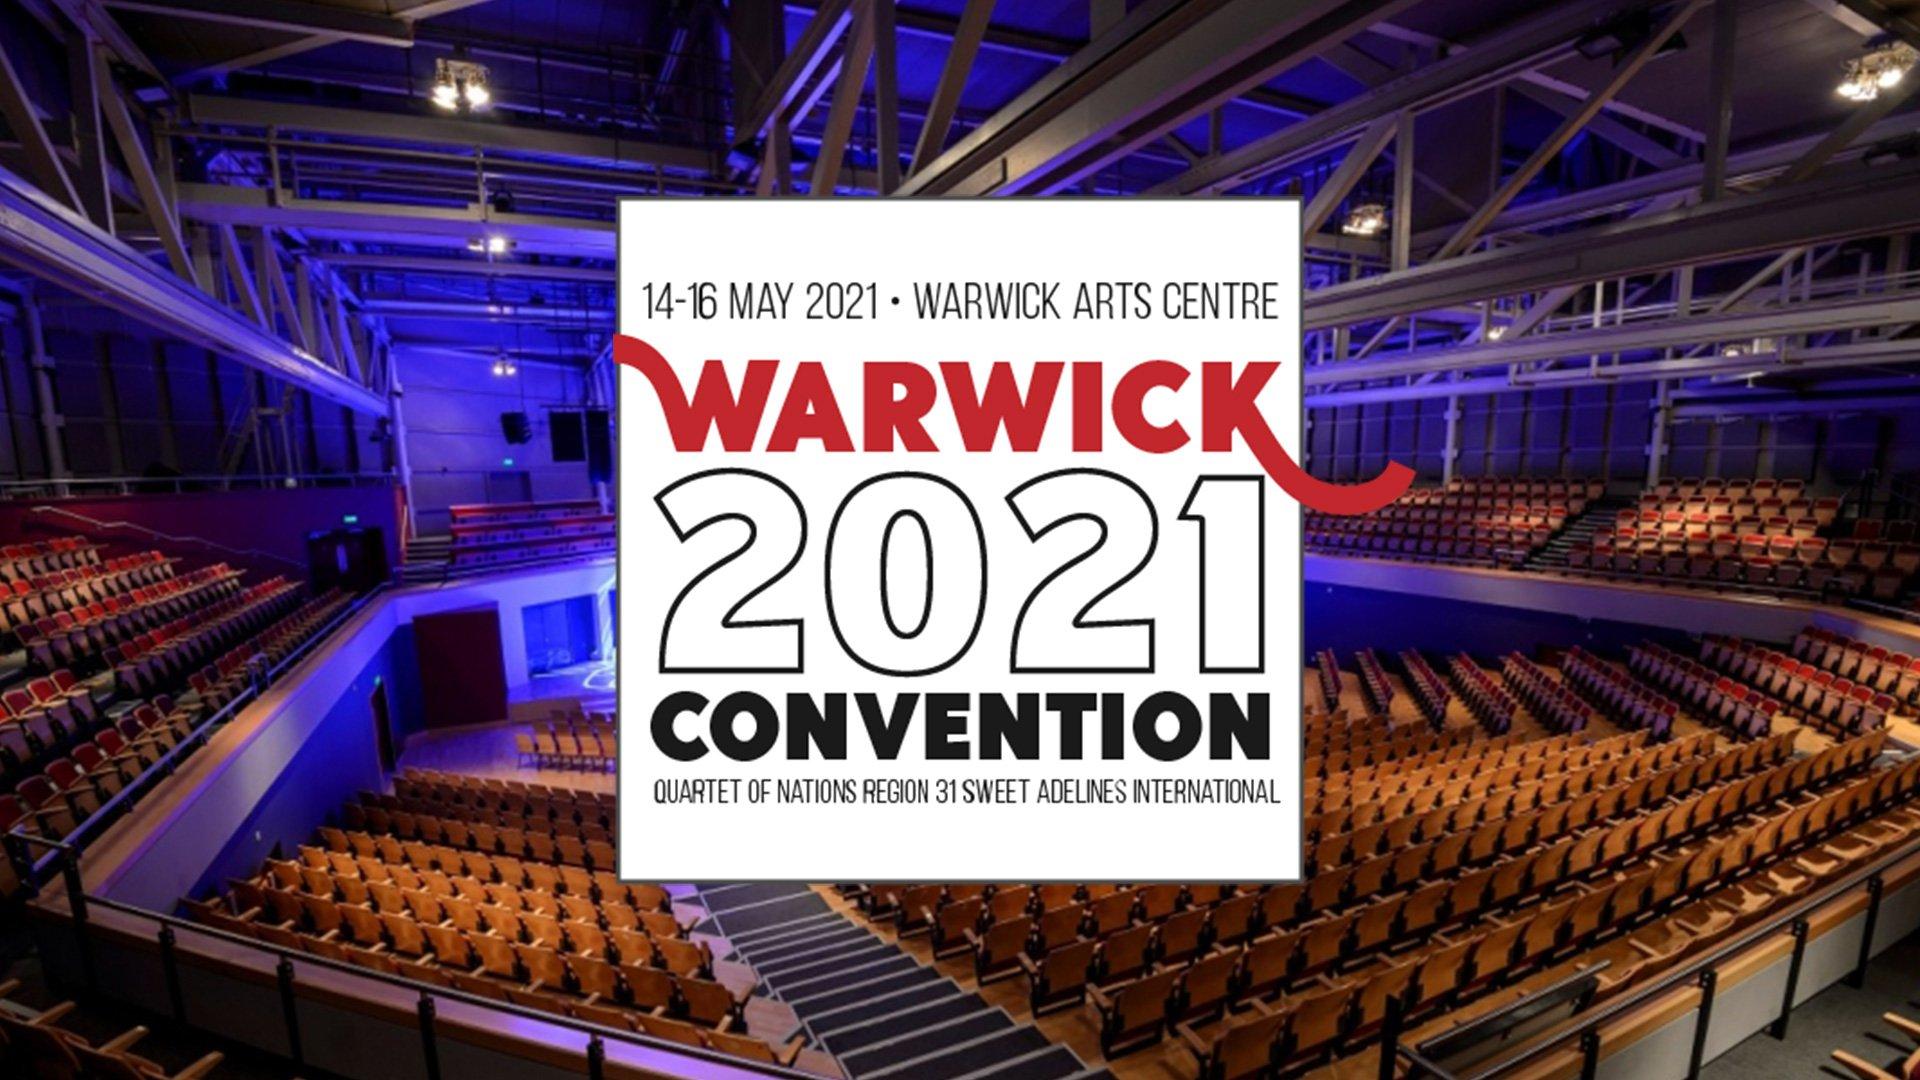 Warwick 2021 Convention